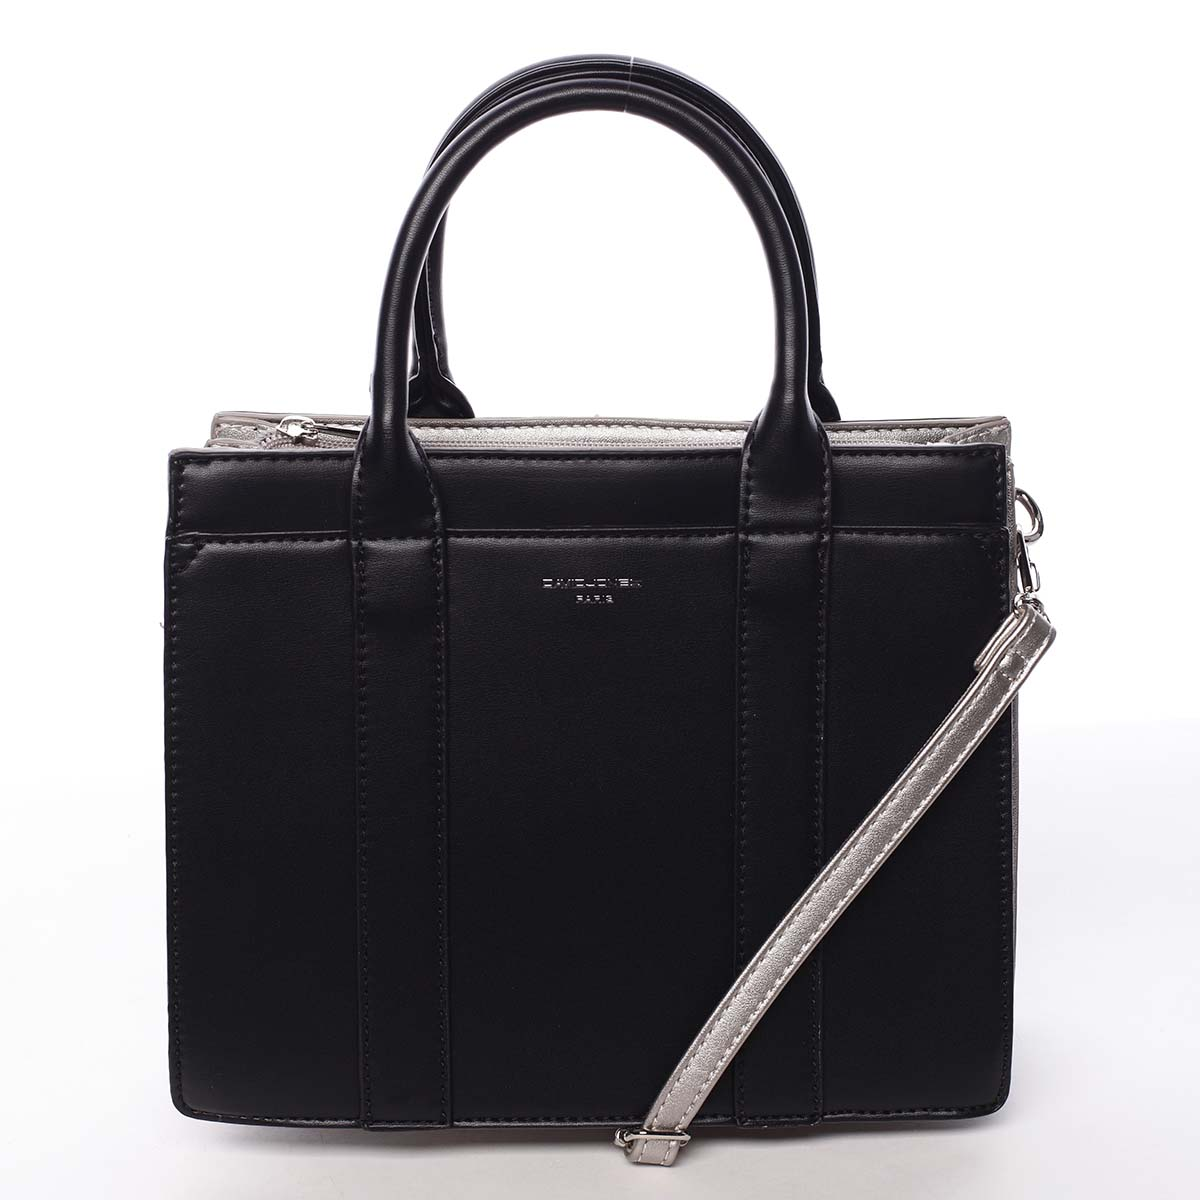 Malá dámska kabelka do ruky čierna - David Jones Akiba